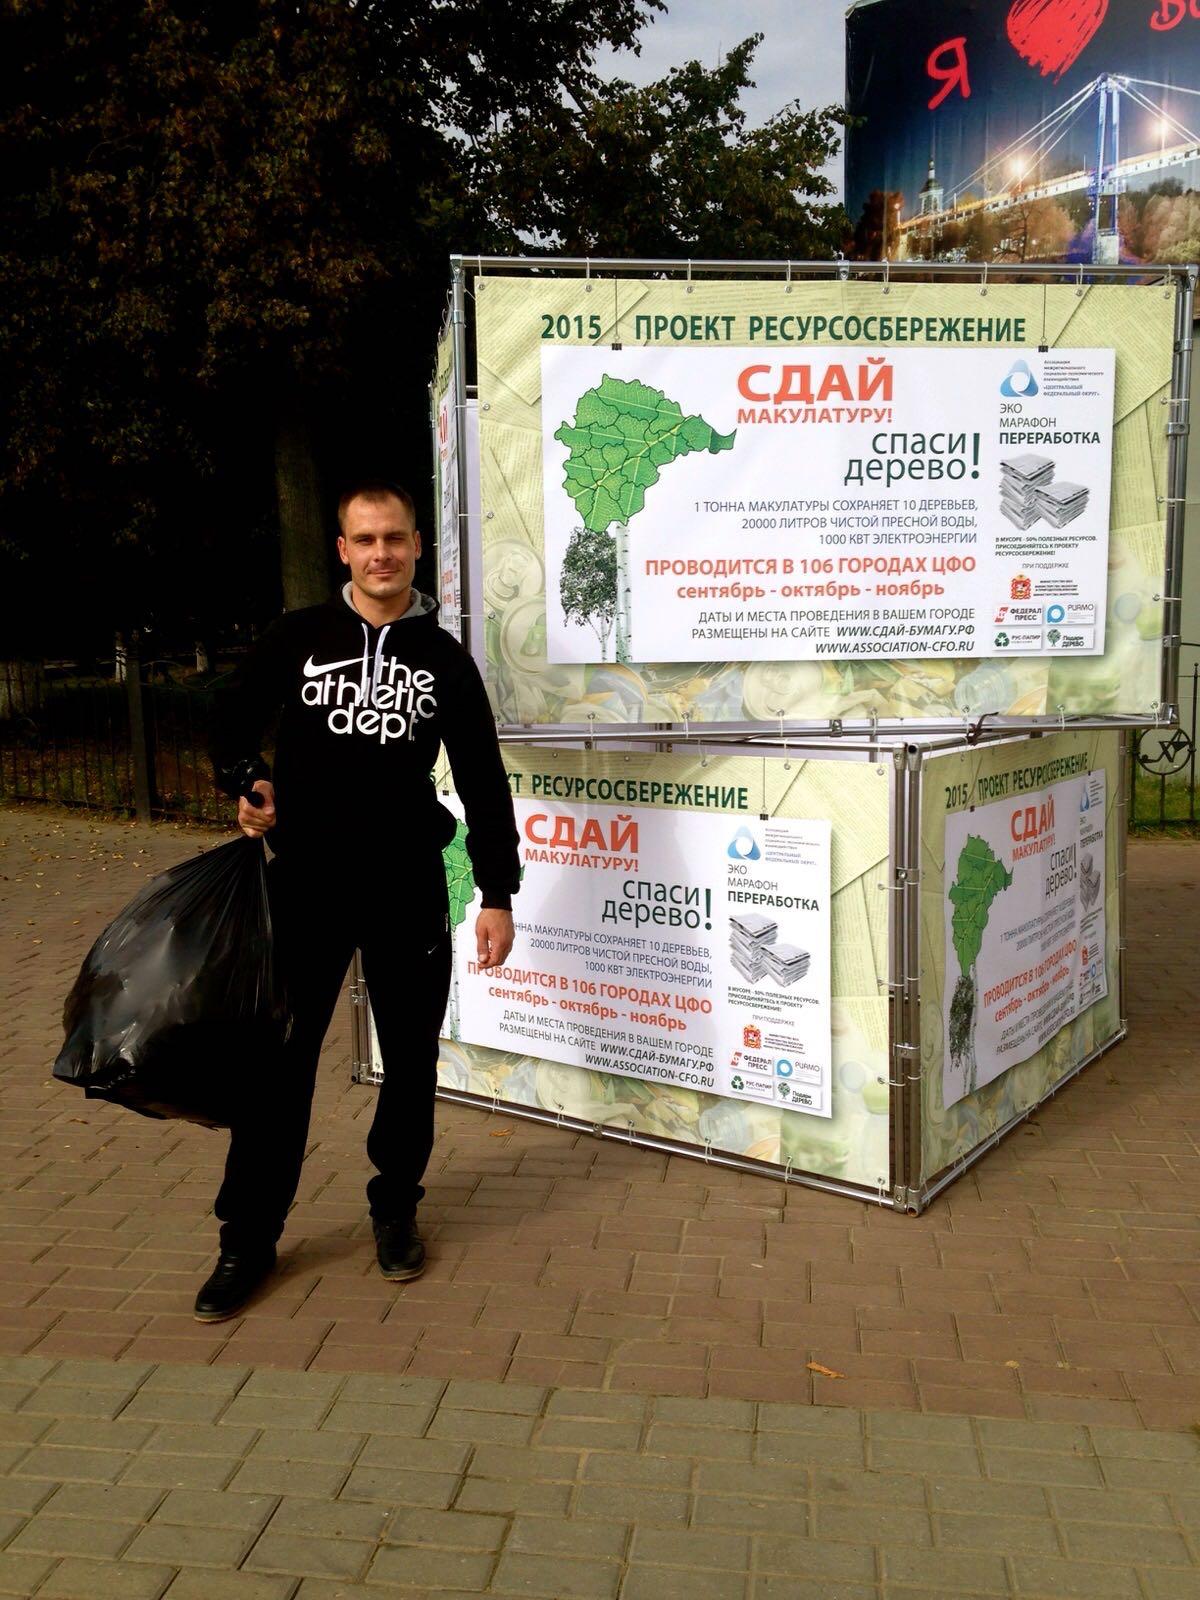 120 кг макулатуры сохраняют от вырубки 3 дерева цена макулатуры в коломне